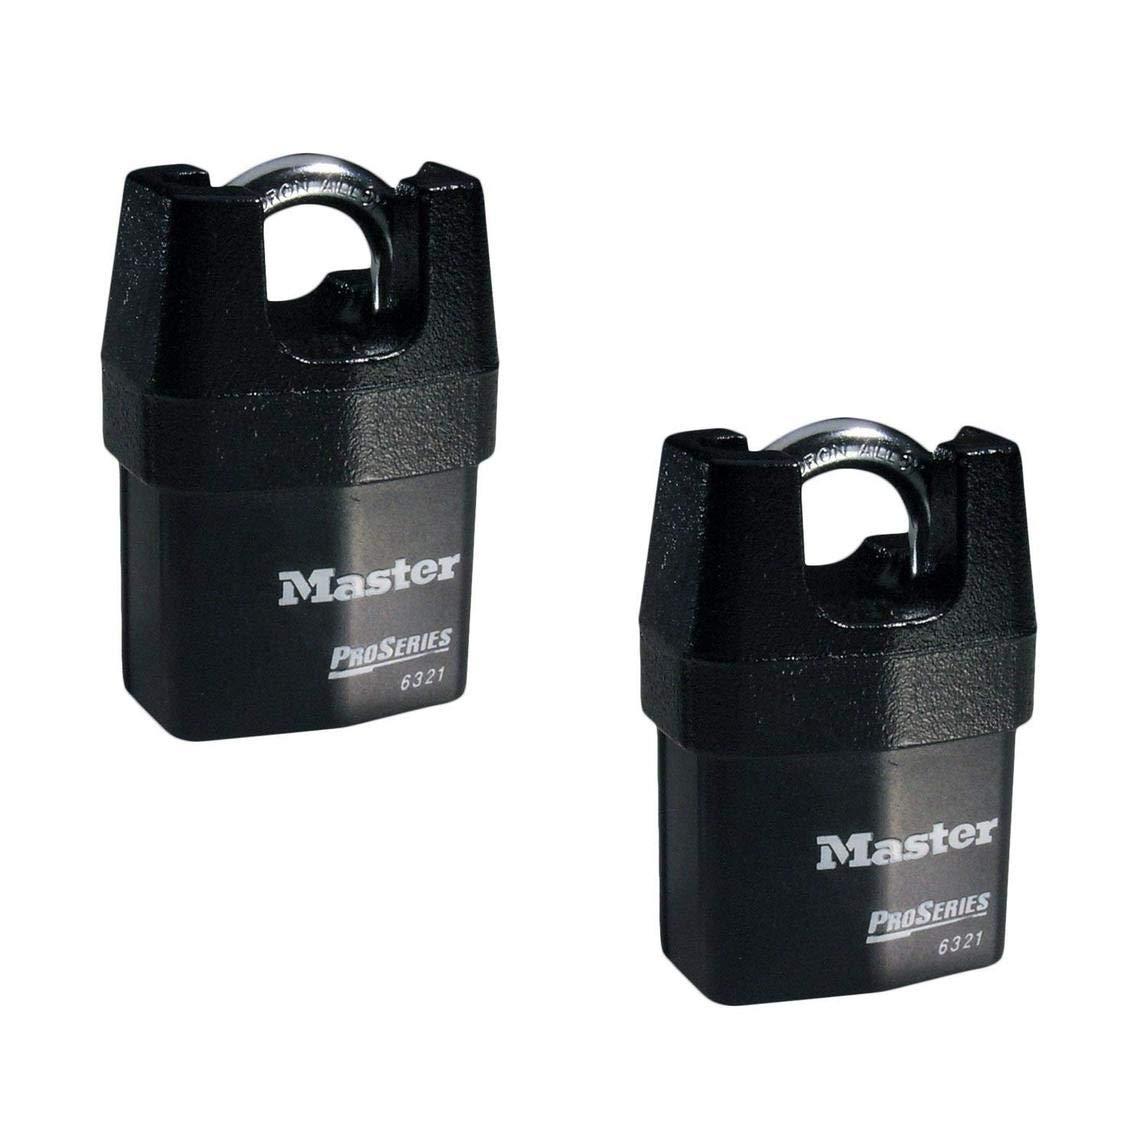 Master Lock - Two (2) High Security Pro Series Padlocks 6321NKA-2 w/BumpStop Technology